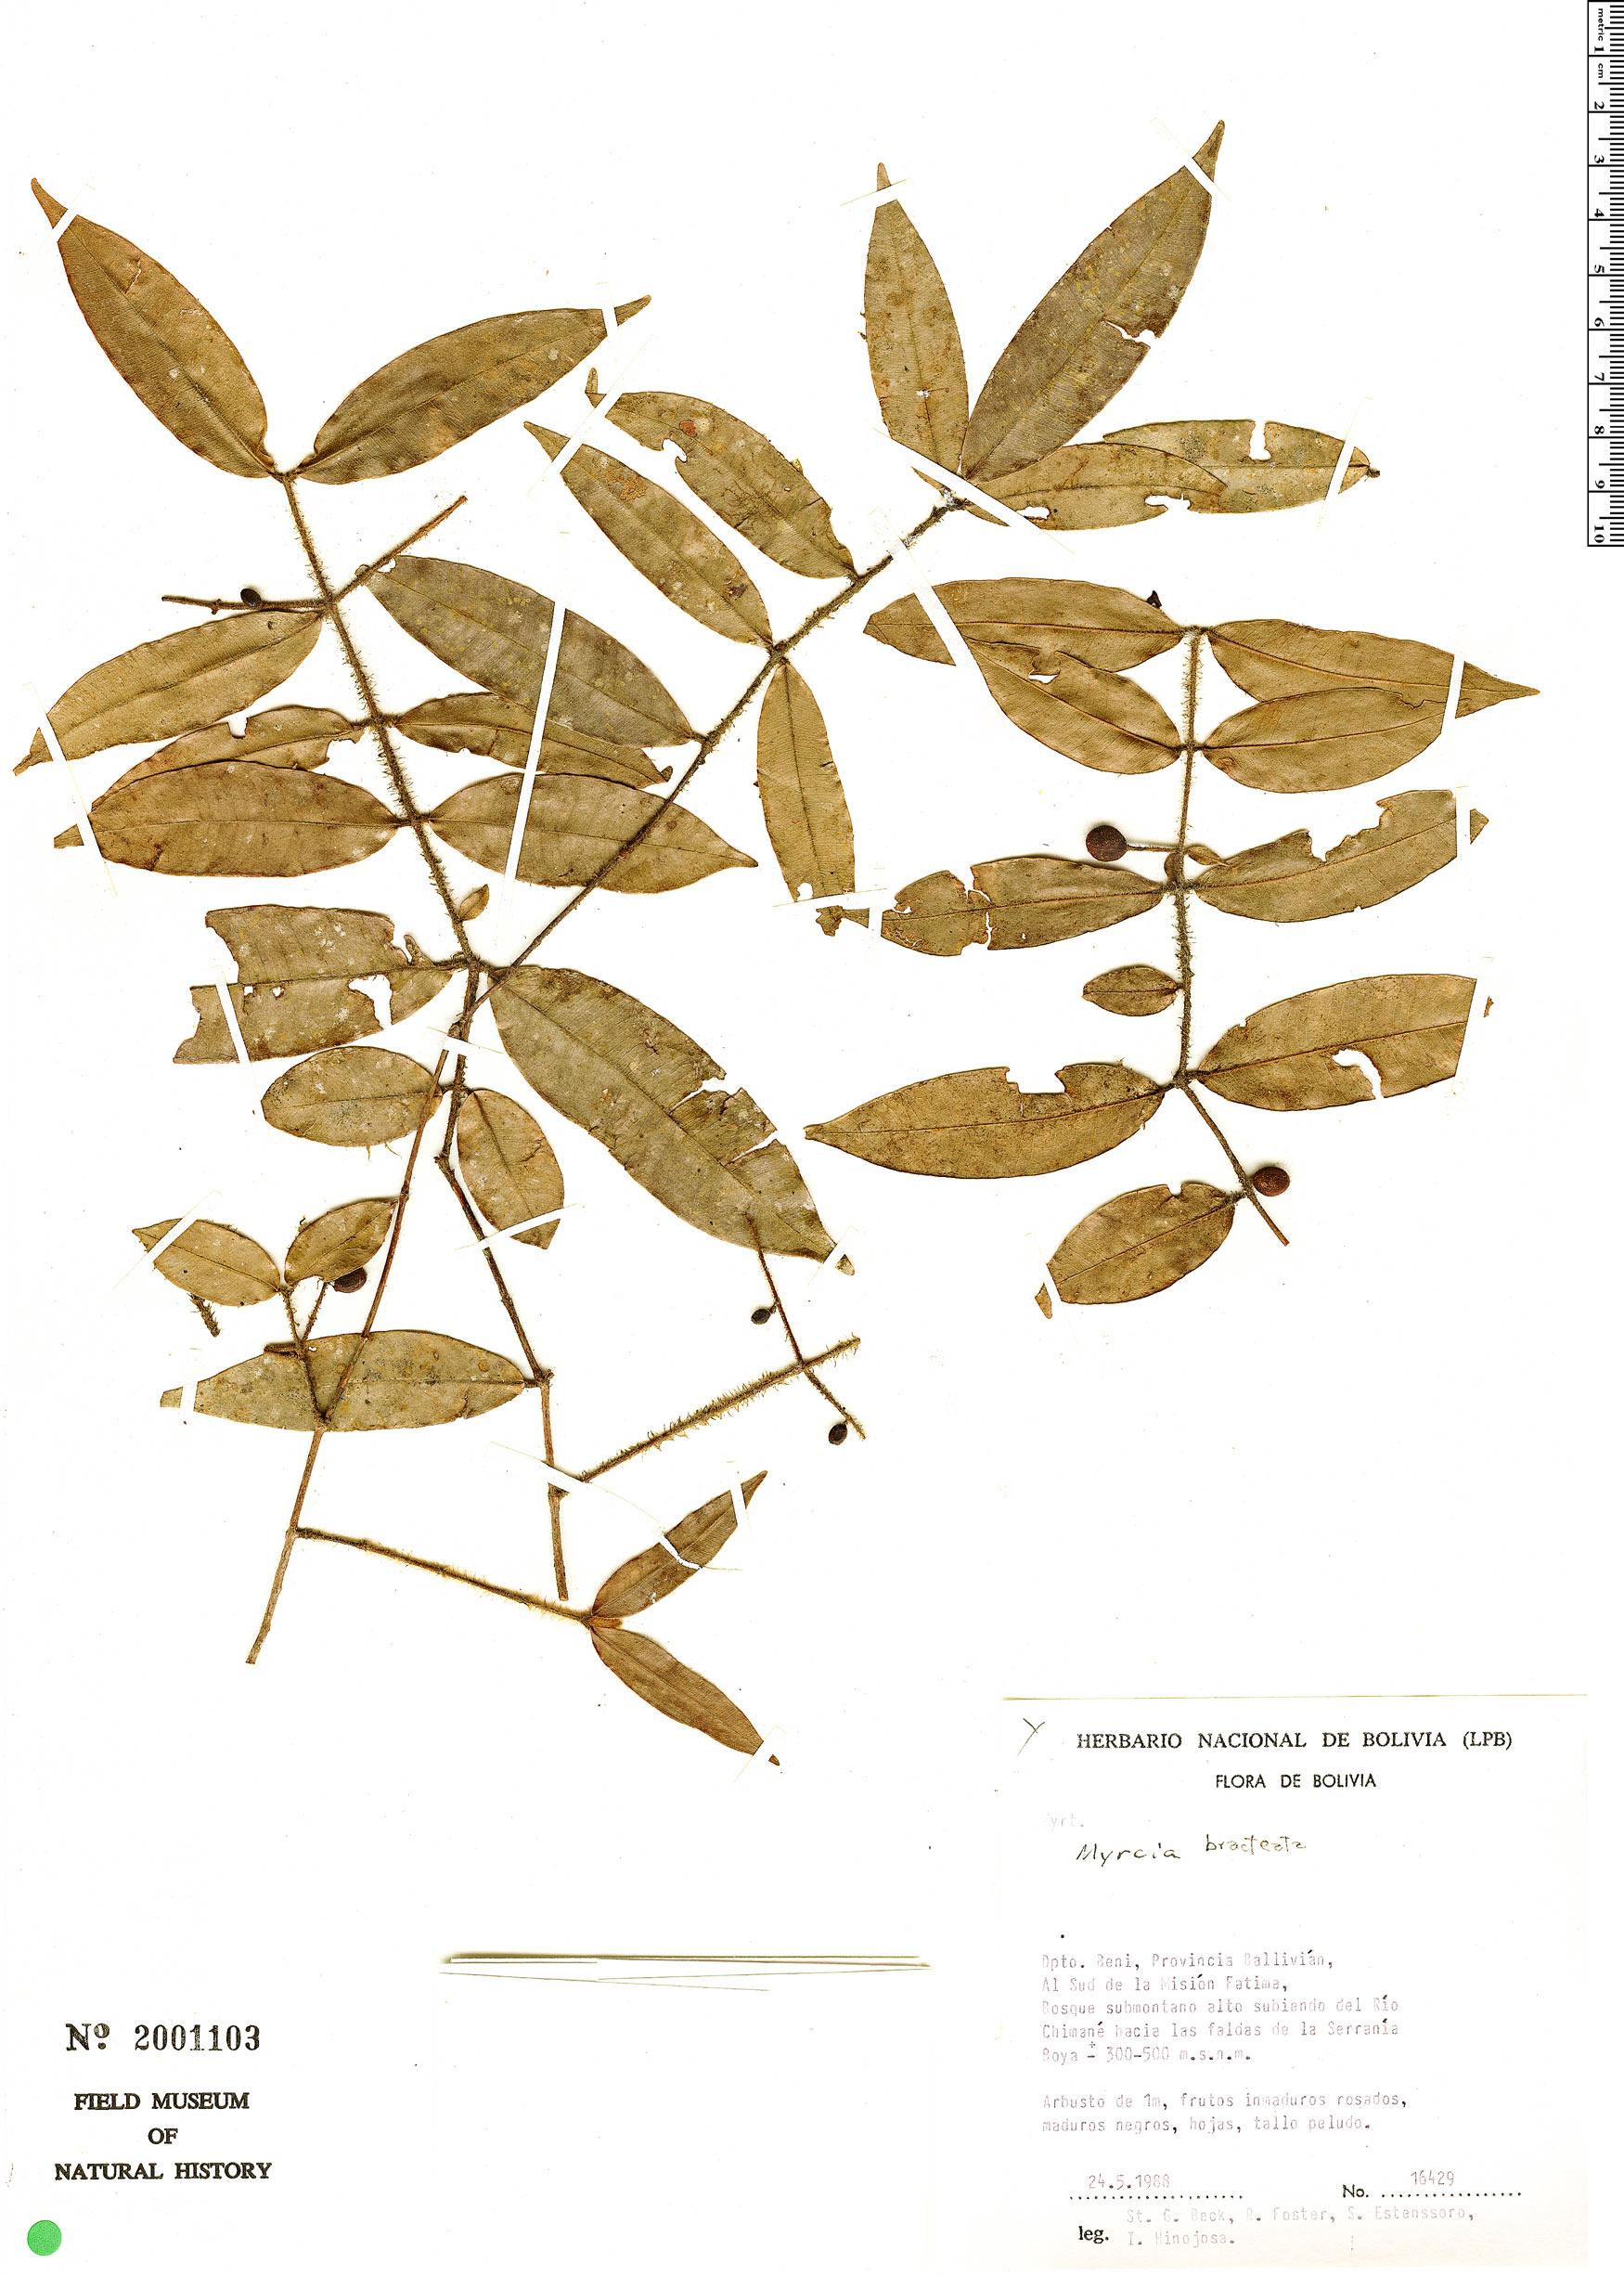 Espécime: Myrcia bracteata